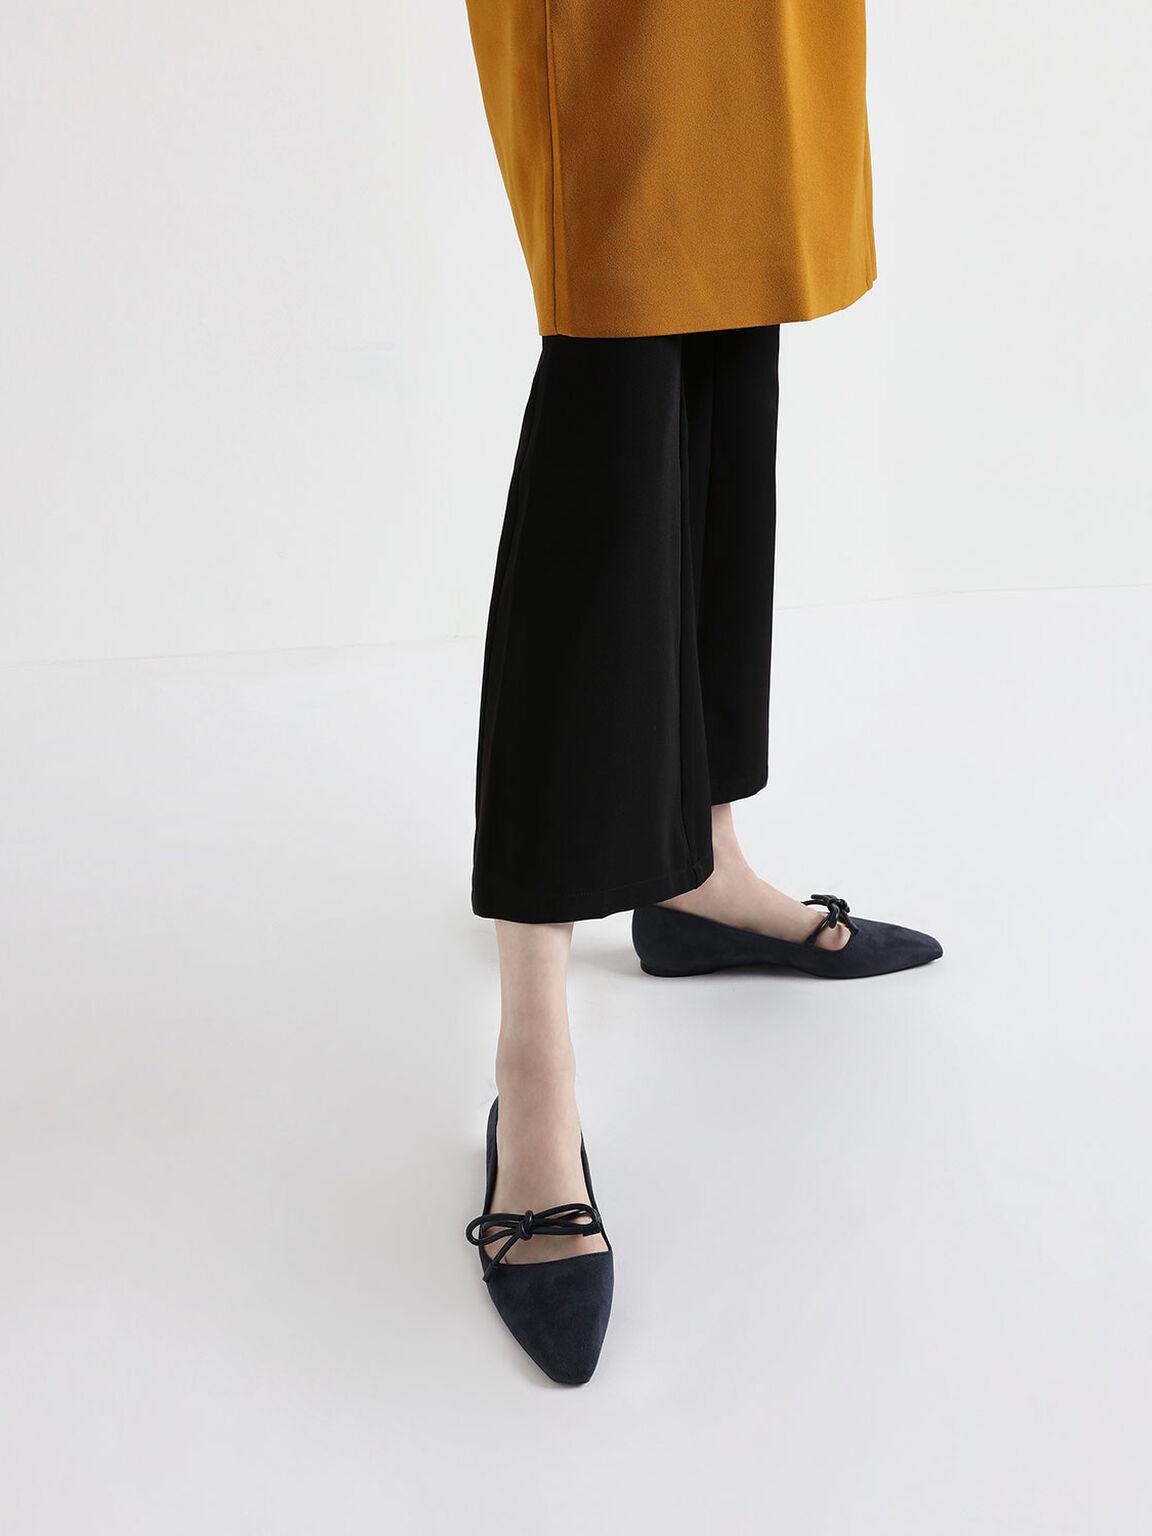 Textured Mini Square Toe Bow Strap Ballerina Flats, Black, hi-res